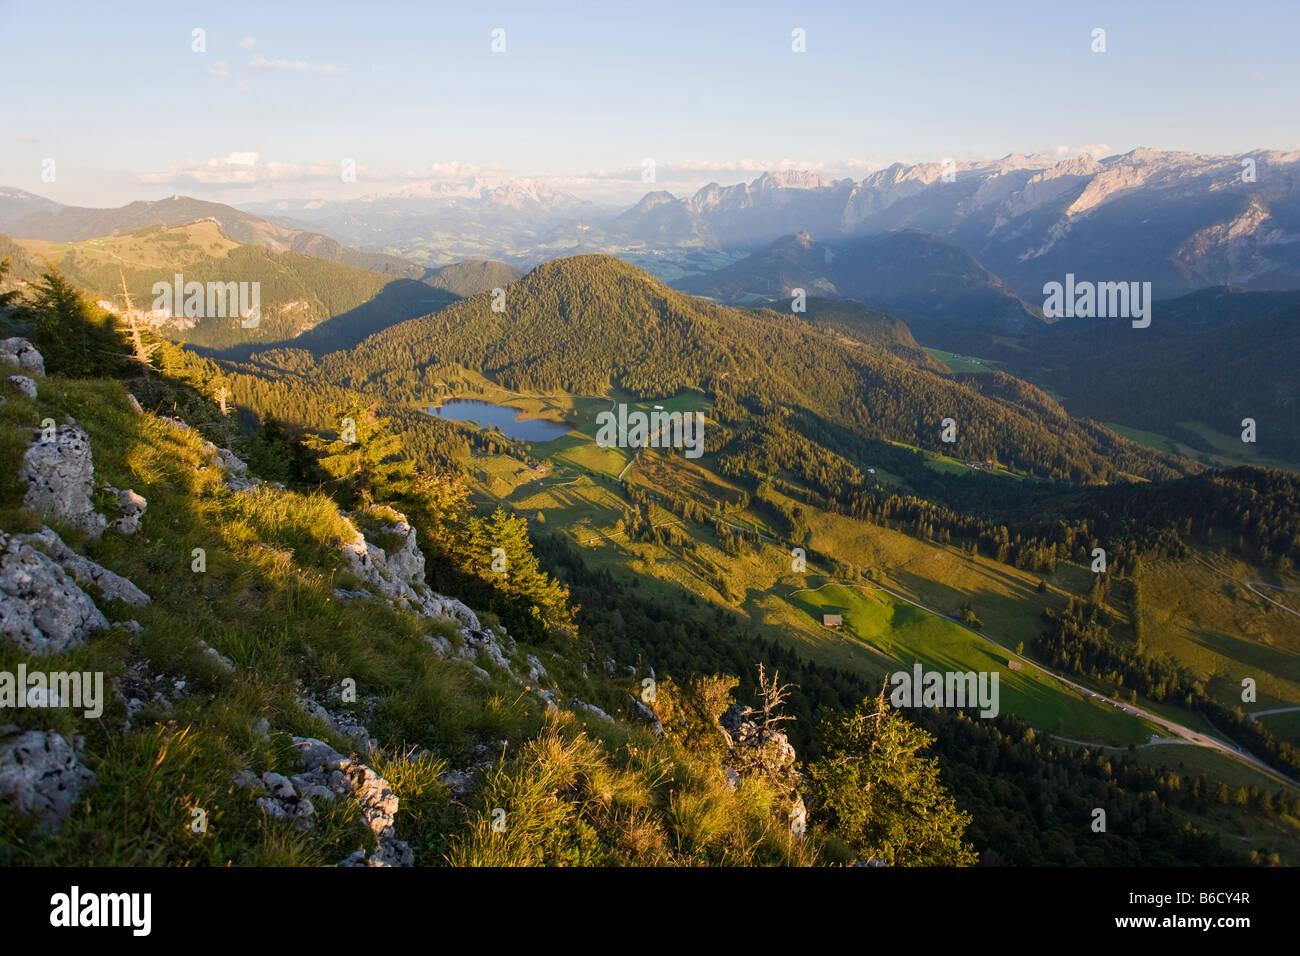 Panoramic view of mountain range Osterhorngruppe Seewaldsee Lammertal Dachsteingruppe Tennengebirge Tennengau Salzburg Stock Photo